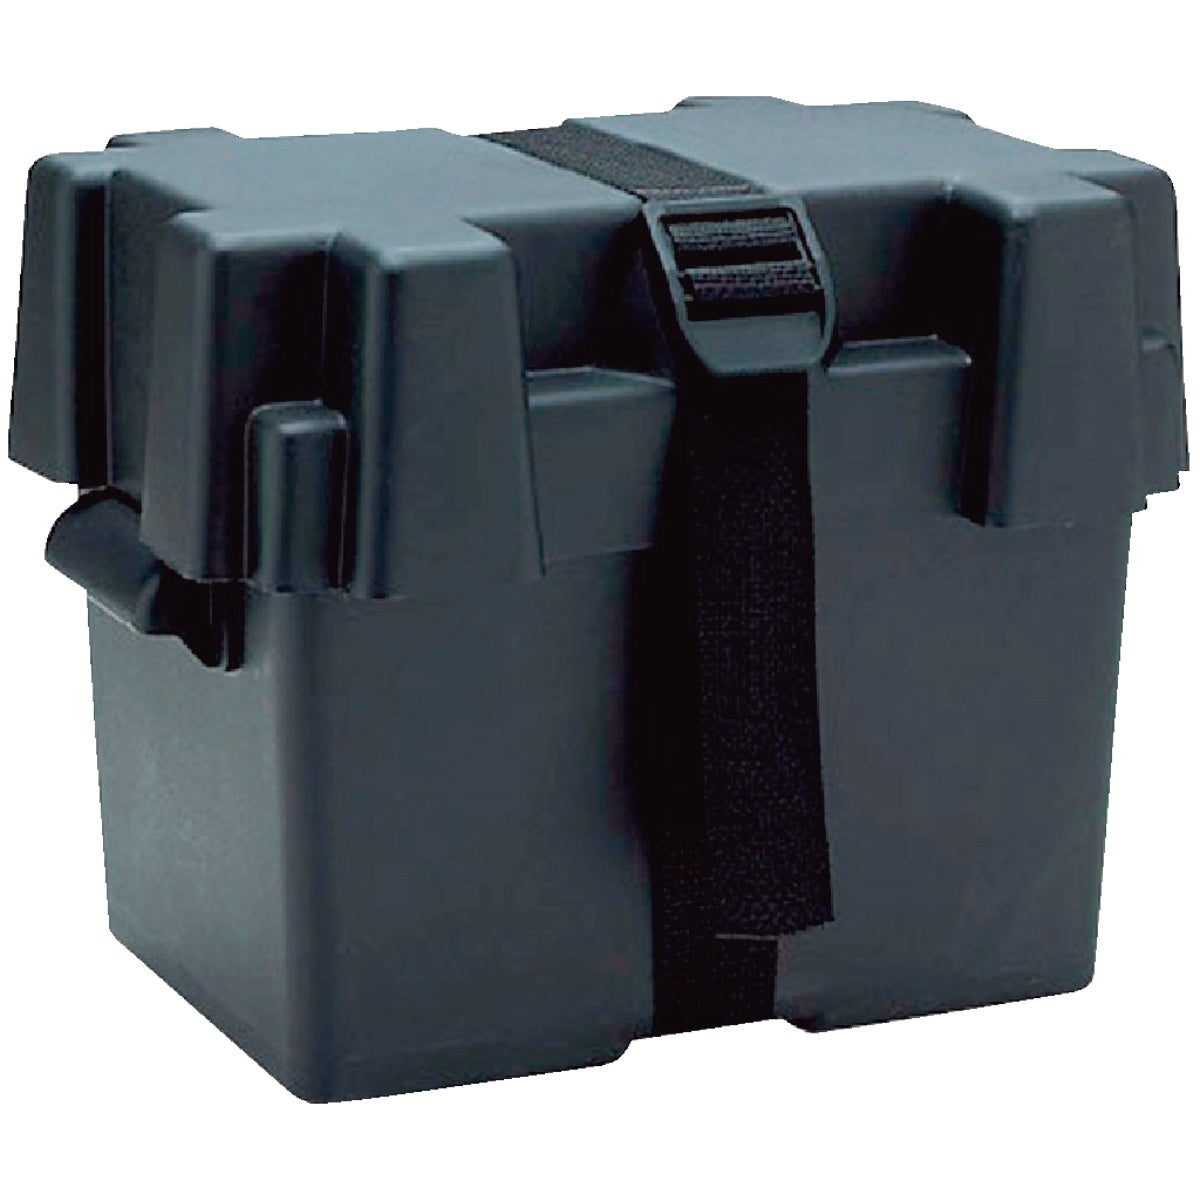 Seachoice Battery Box, 22080